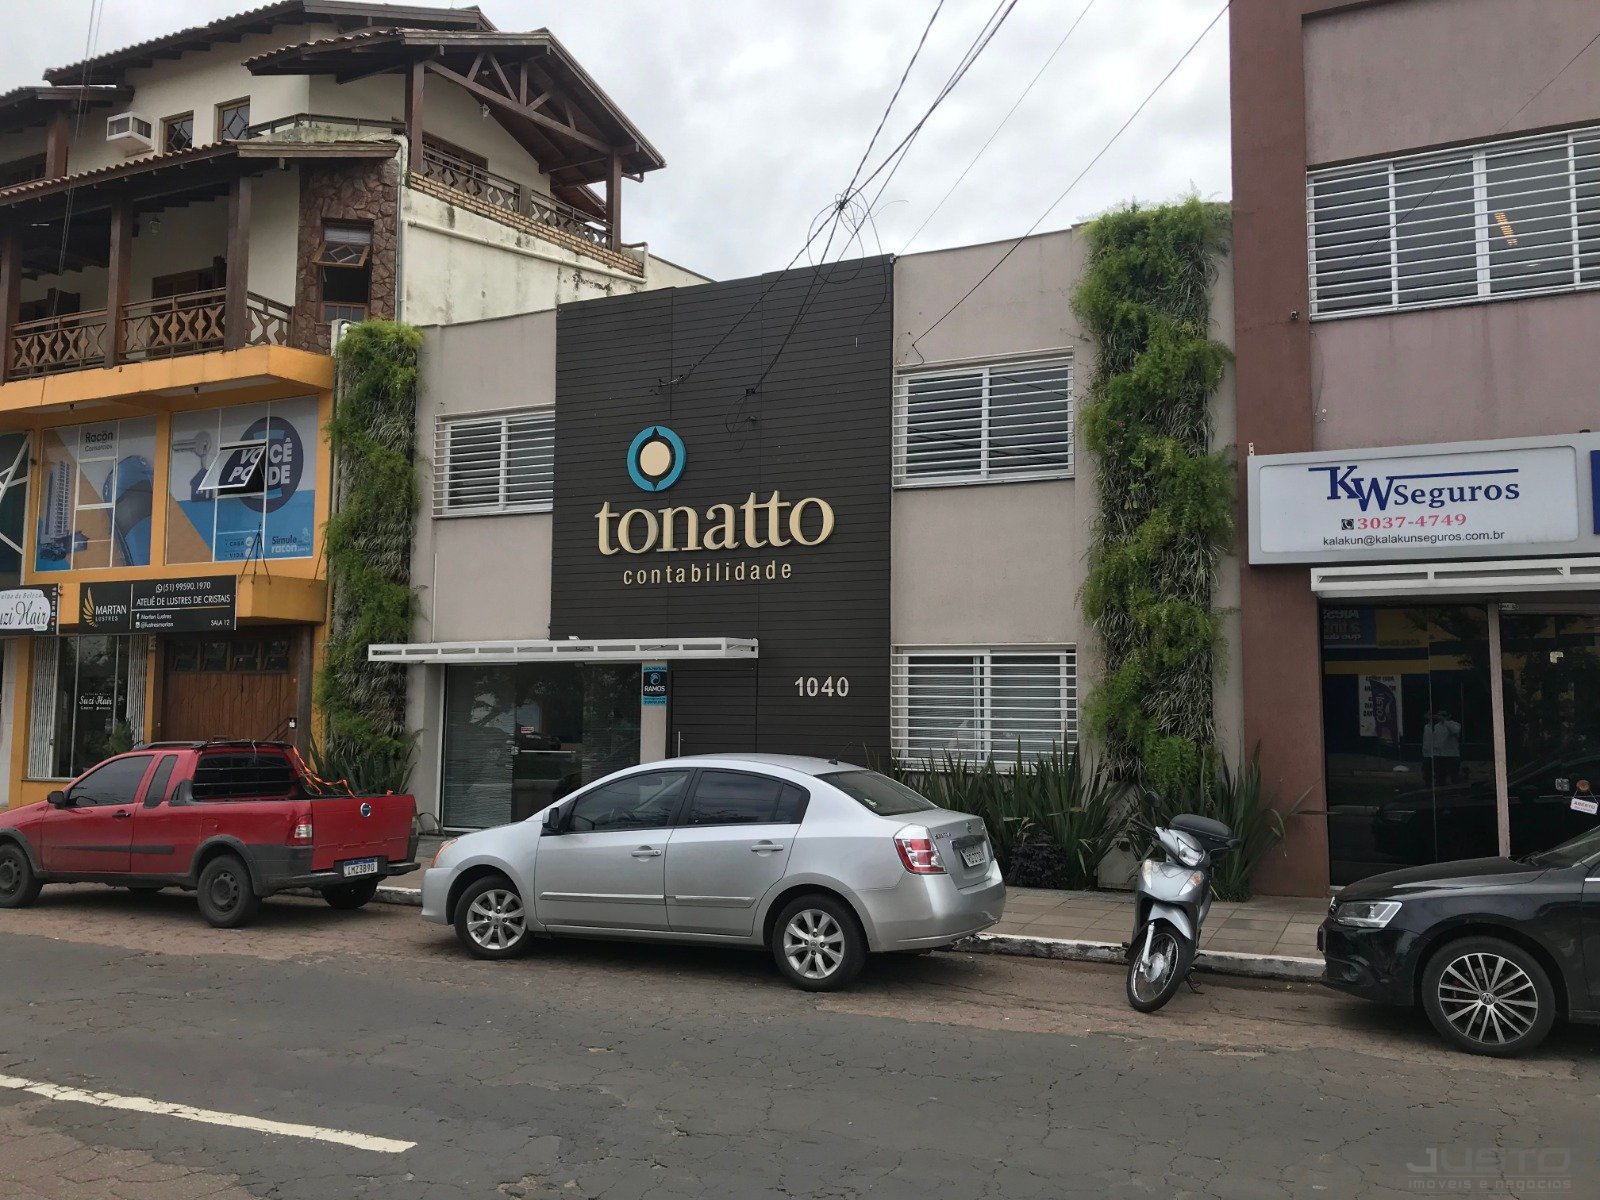 Conj/Sala Comercial Rio Branco São Leopoldo